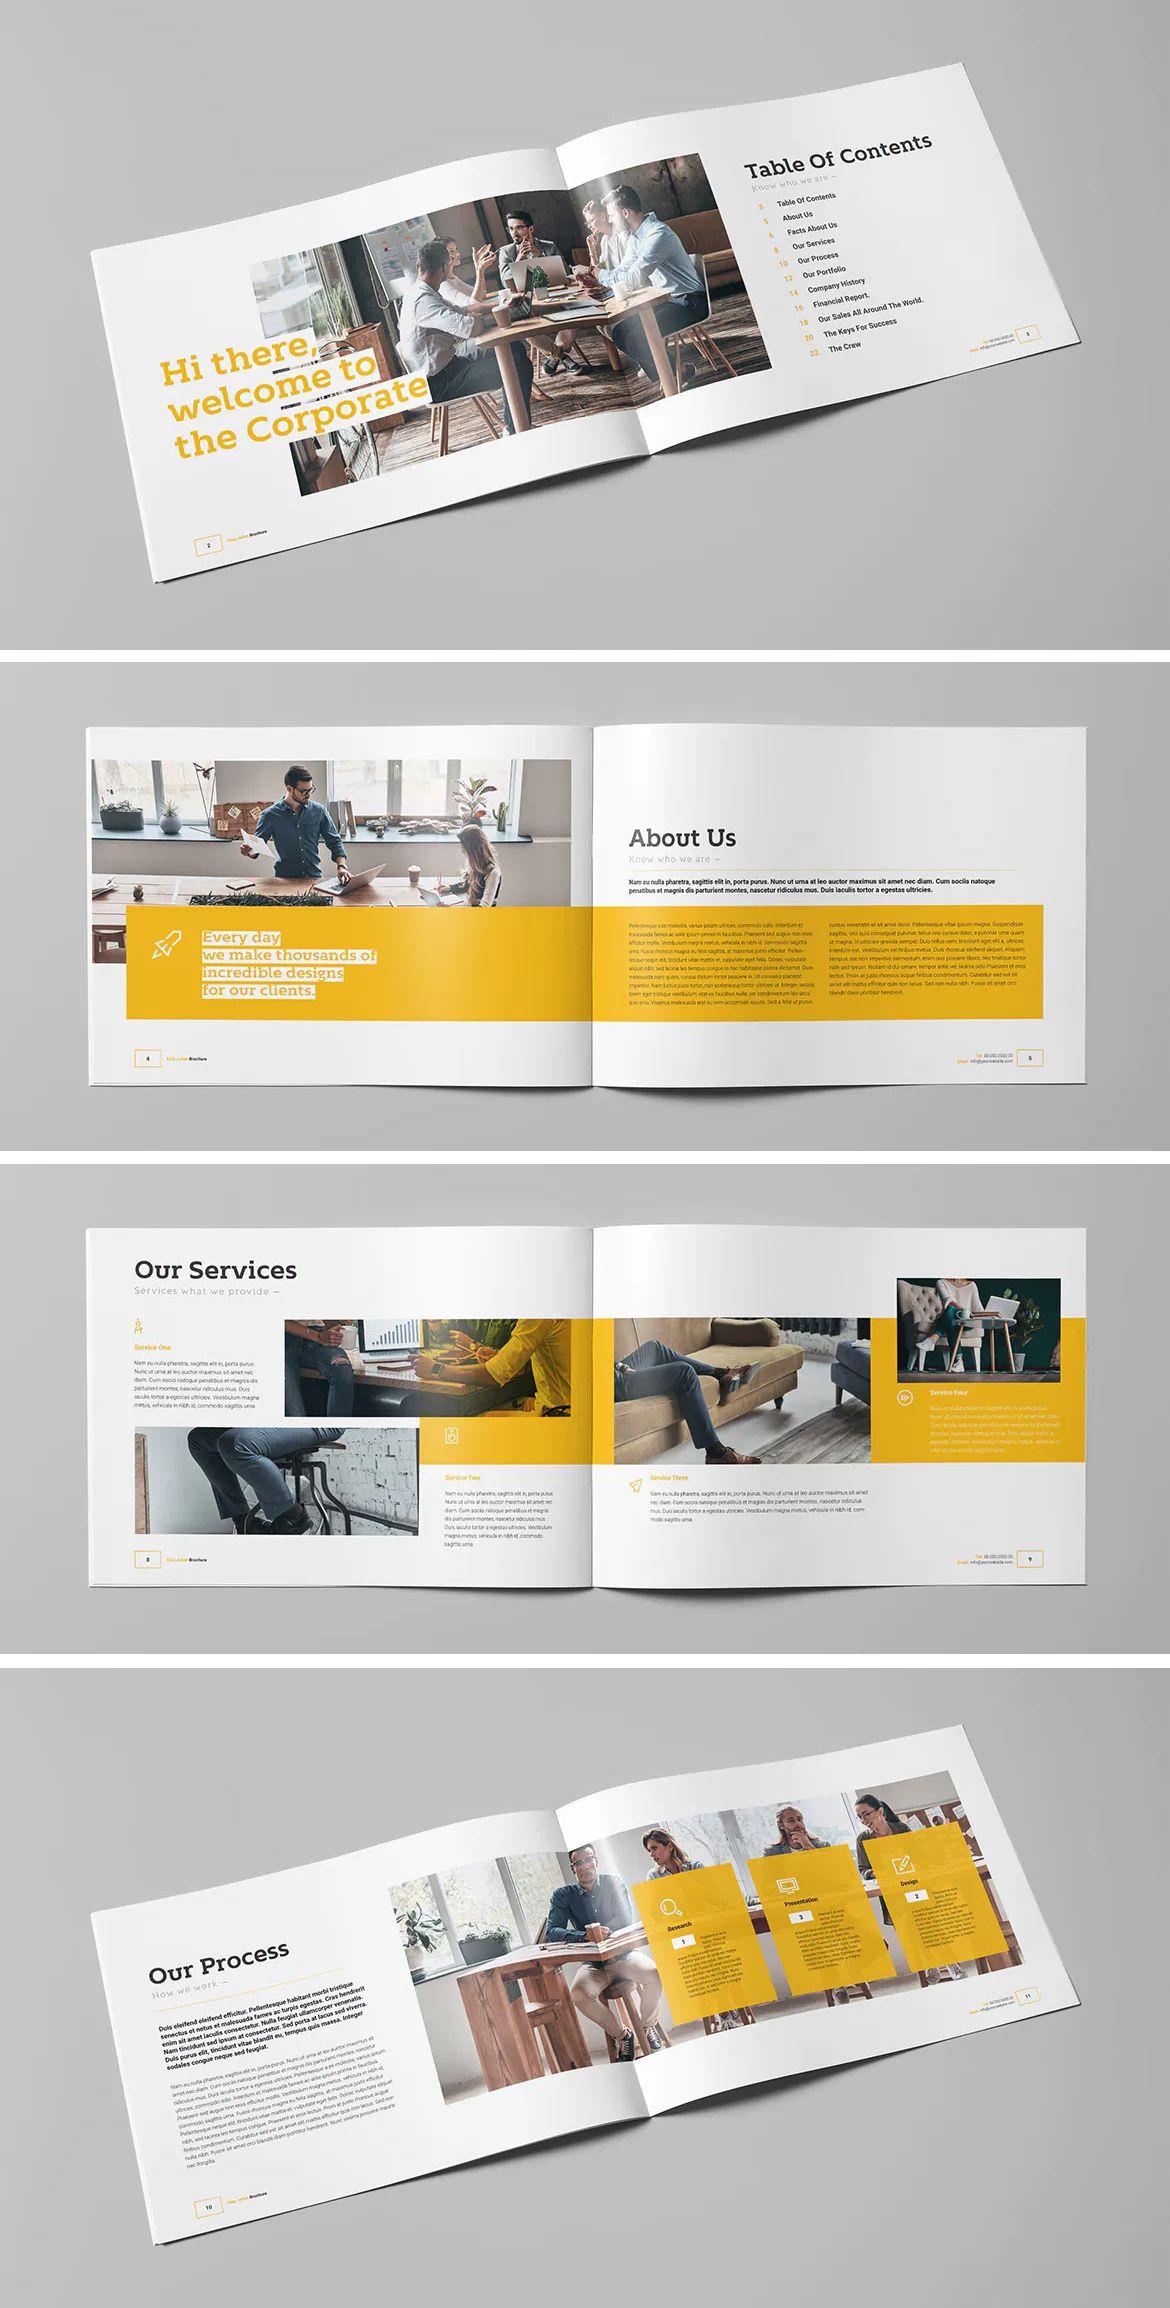 Business Landscape Brochure Template Indesign Indd 24 Pages Download Brochure Business Brochure Brochure Template